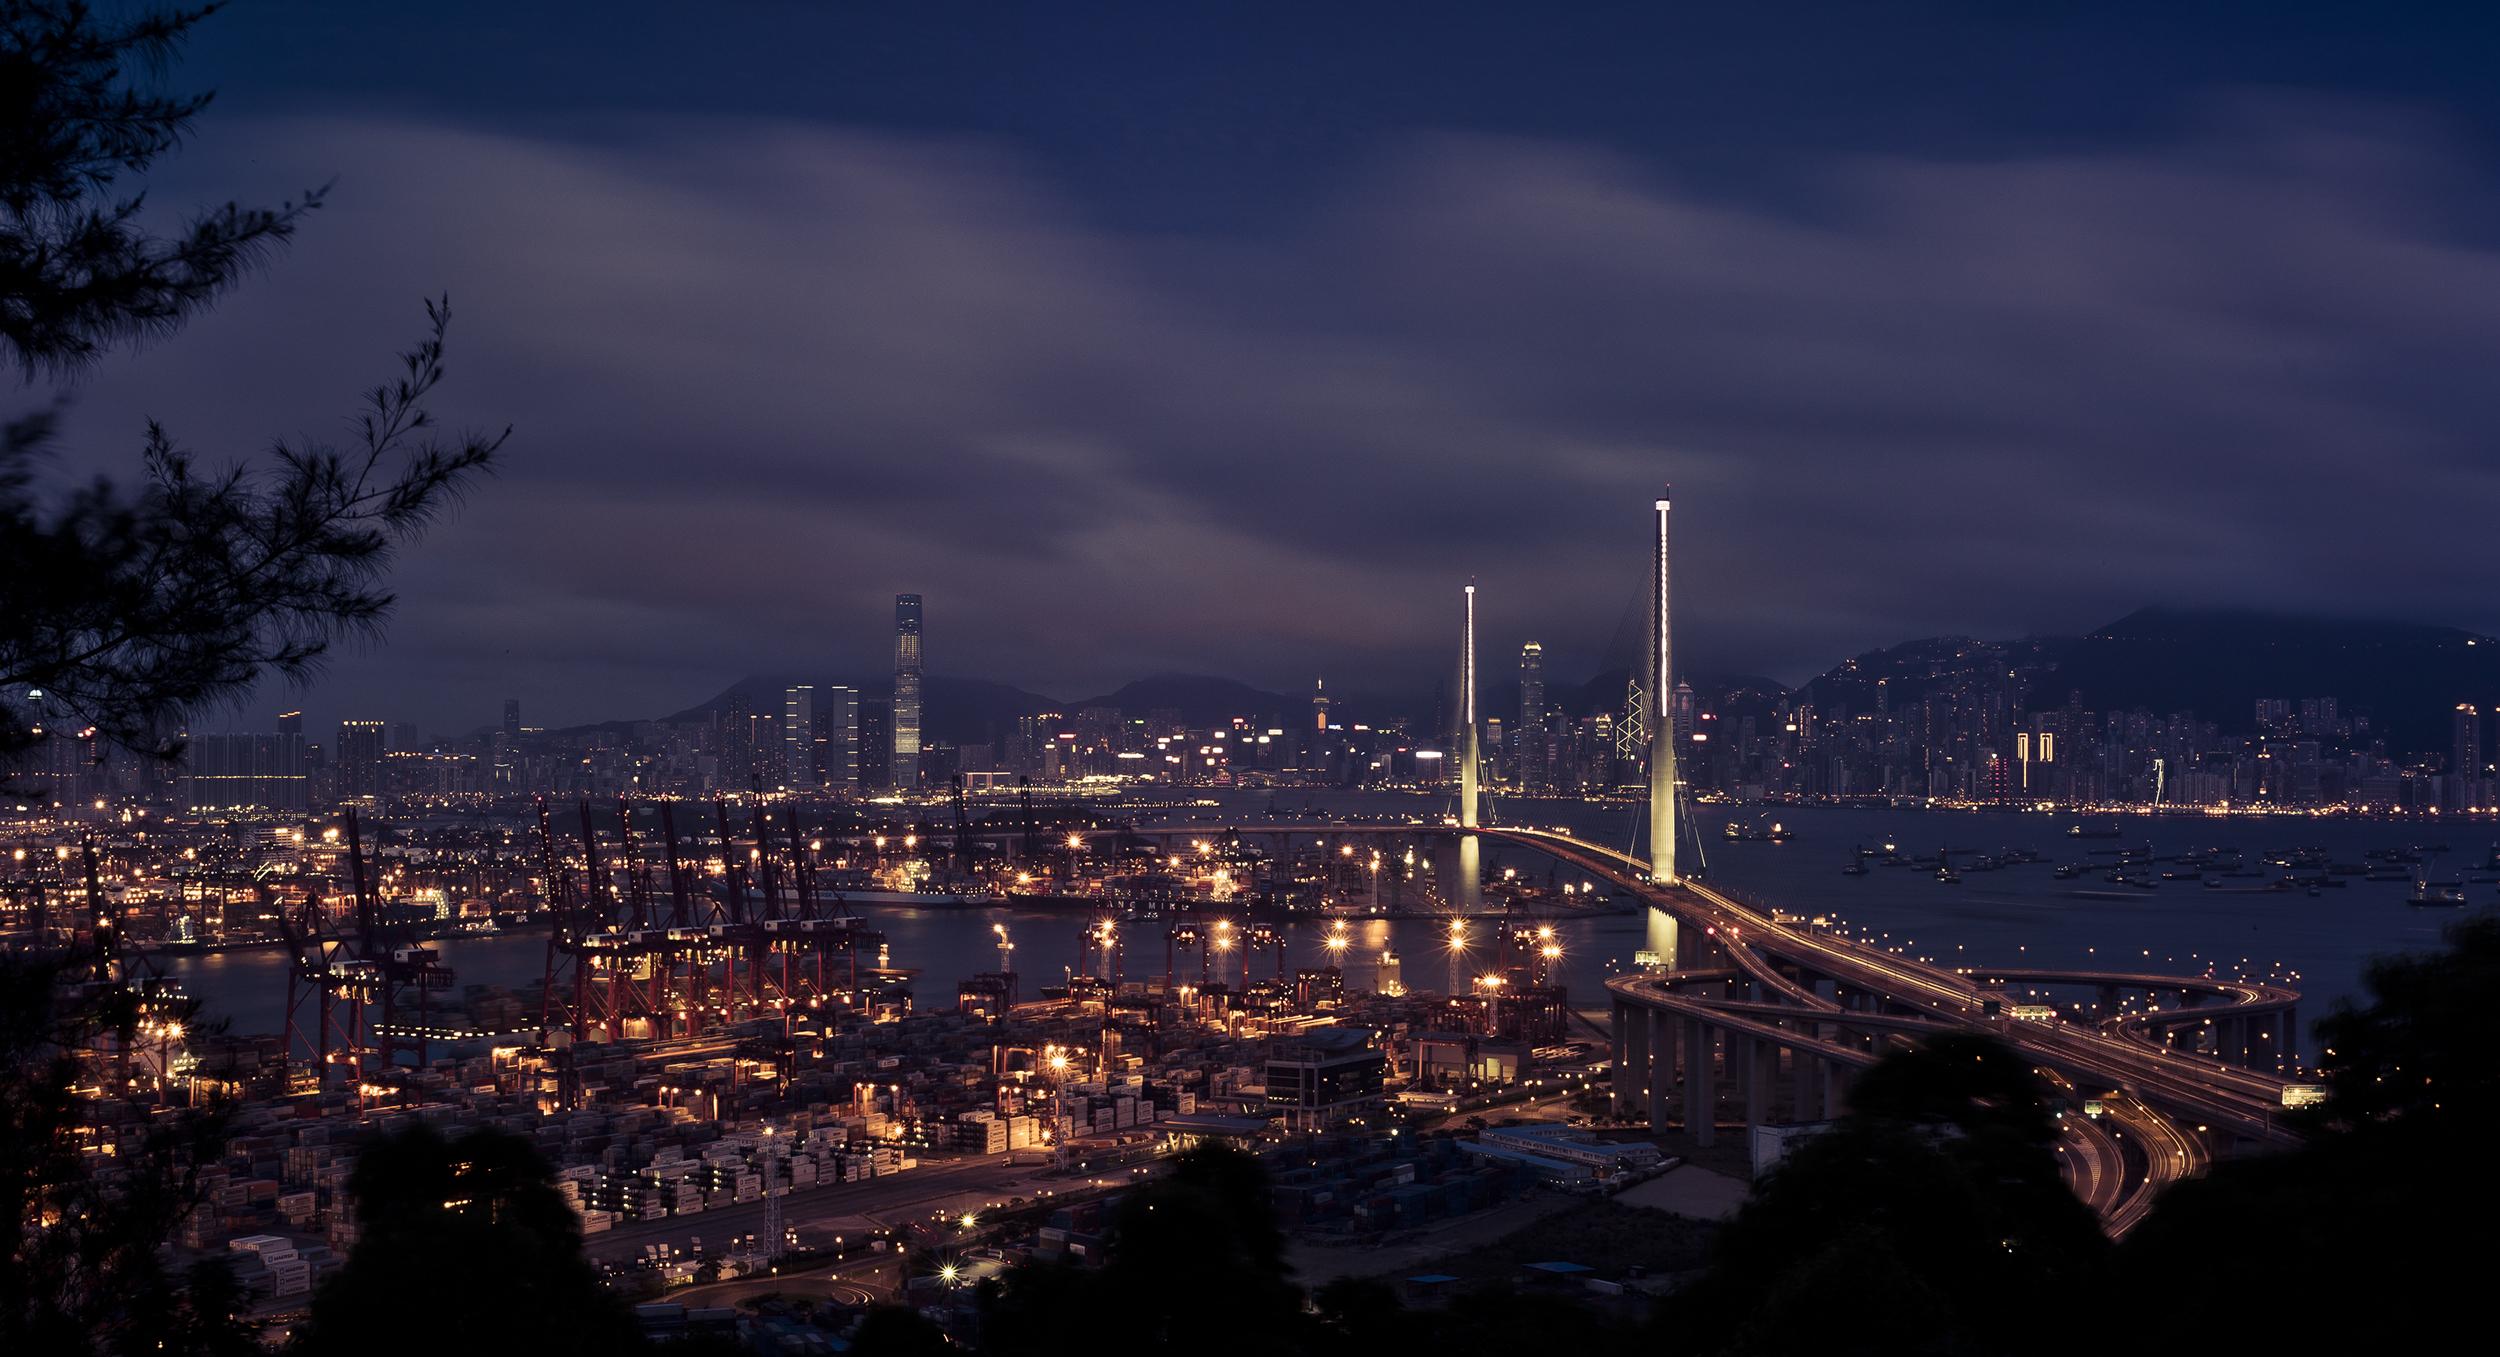 Stonecutters Bridge    Download image